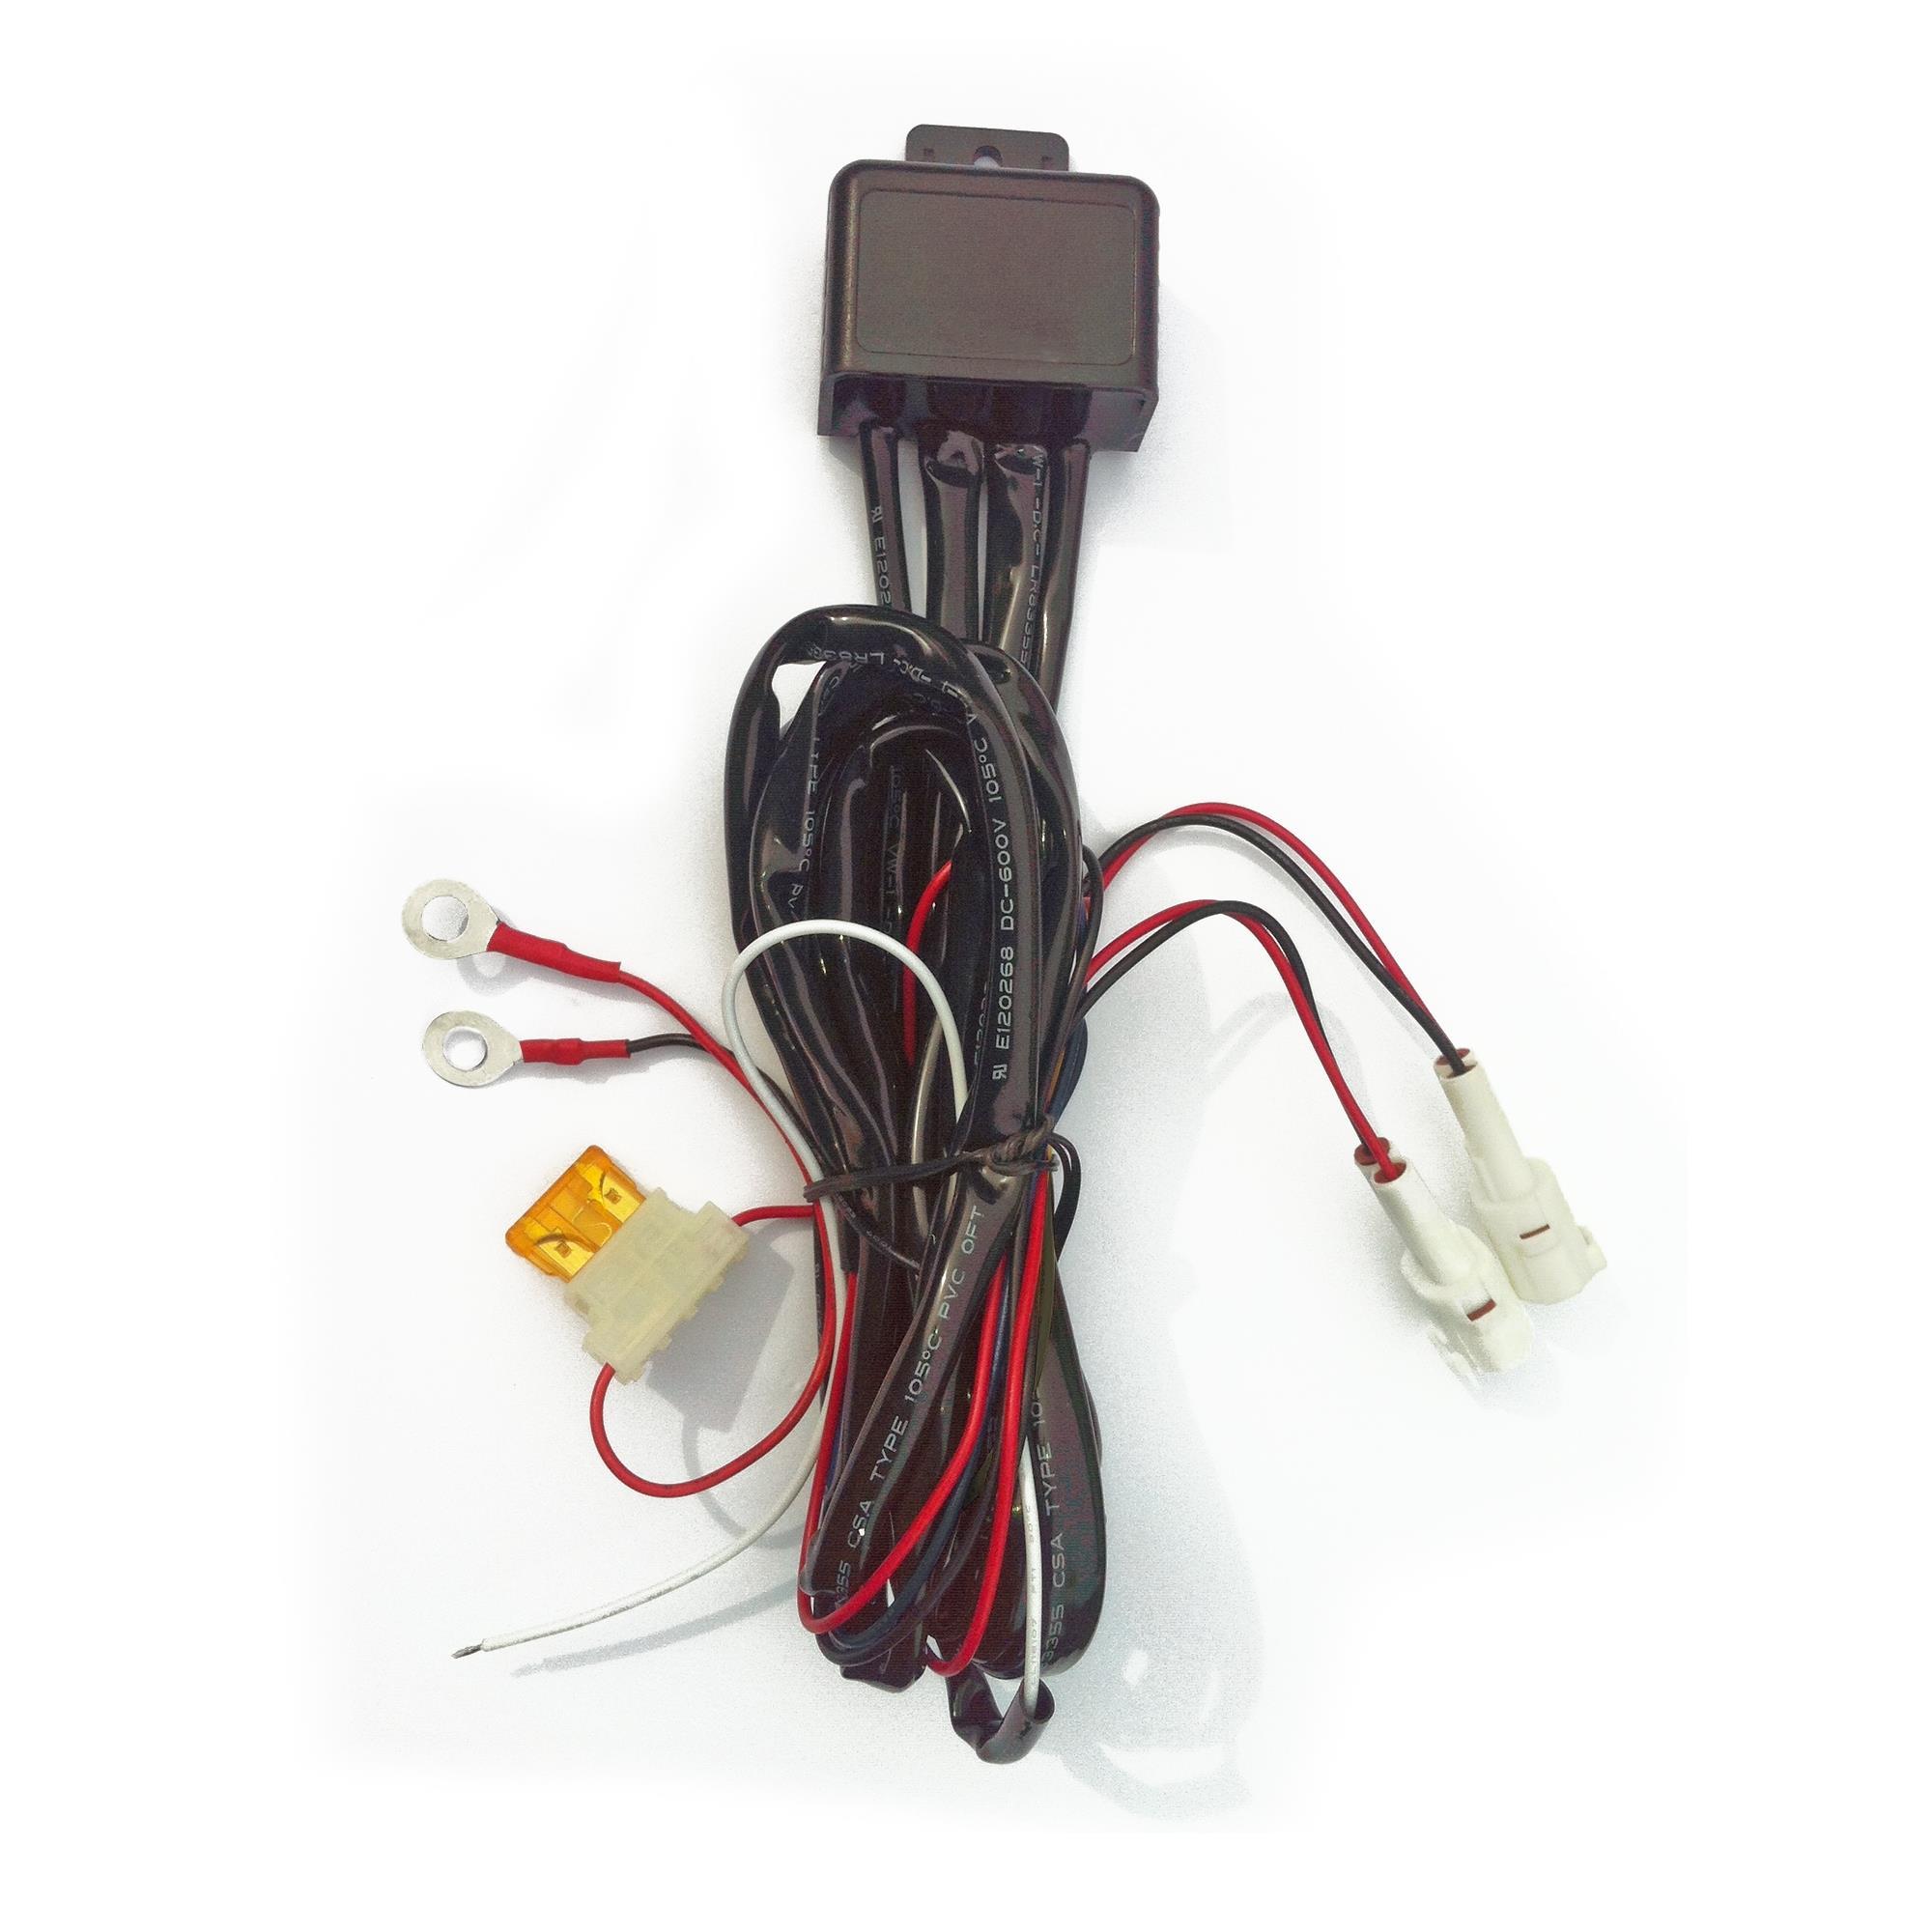 JOM Universal Sportluftfilter Mini Luftfilter 9,12mm und 25mm Anschluß ROT